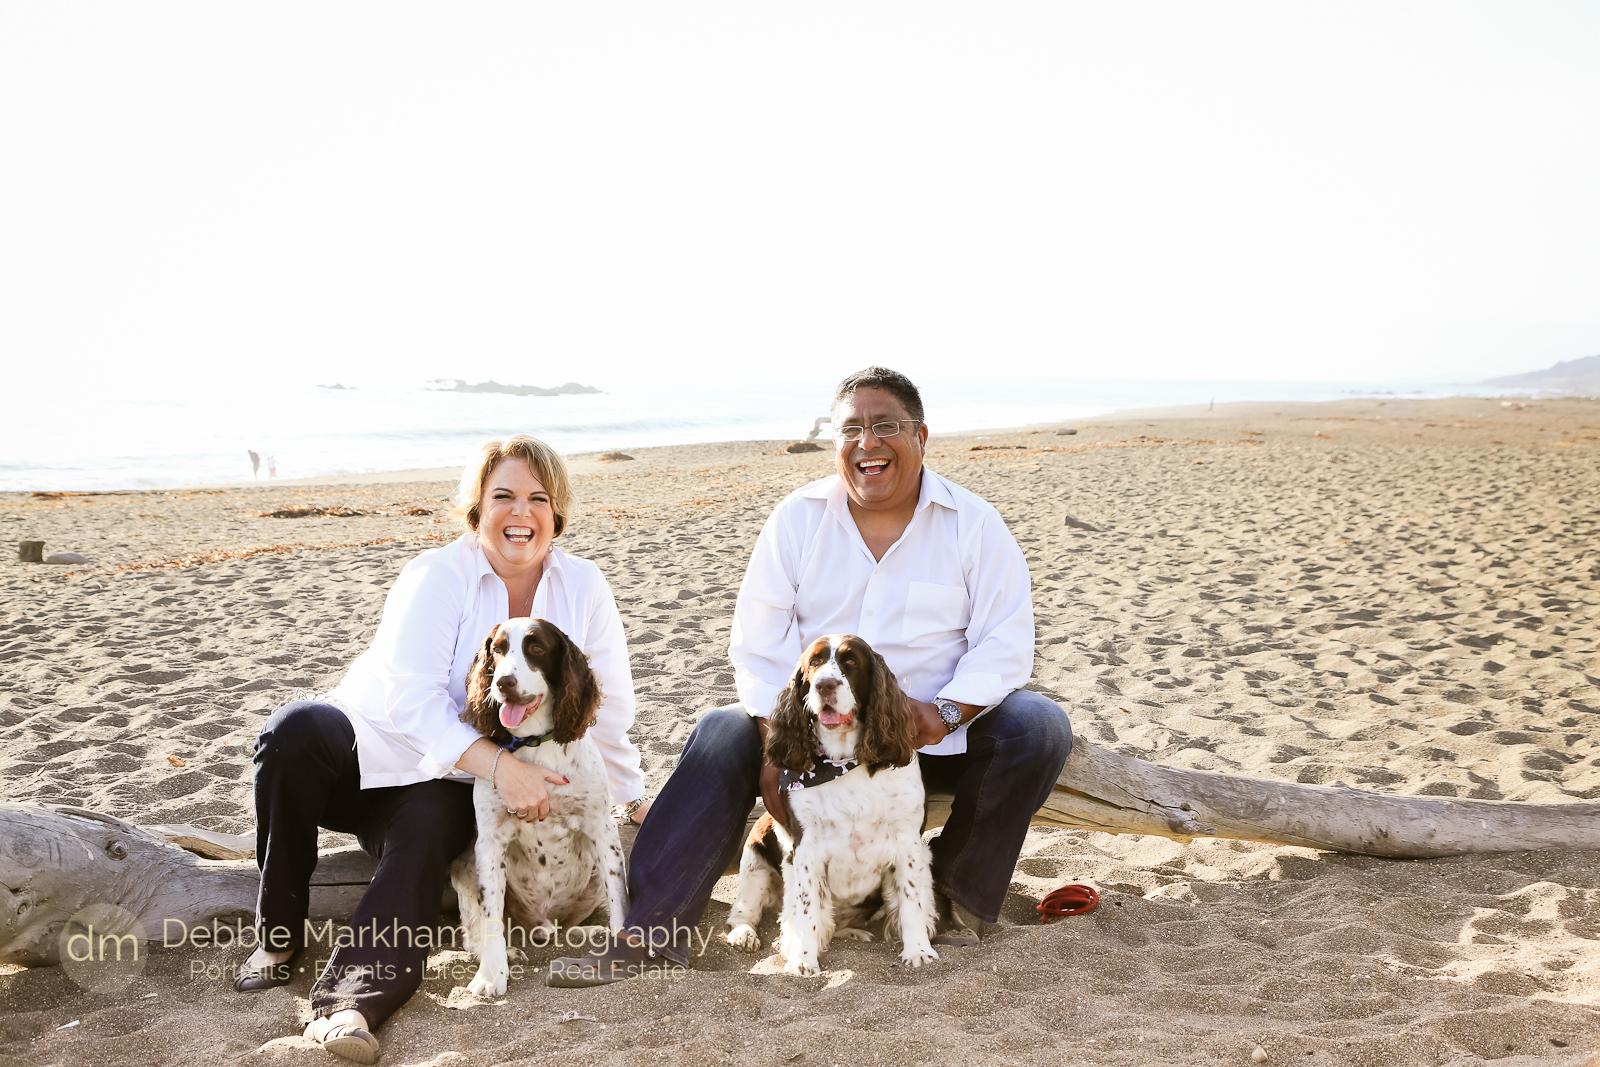 Debbie Markham Photography-Family Photographer_San Luis Obispo_Cambria_Morro Bay_Los Osos_Pet Photographer-3615